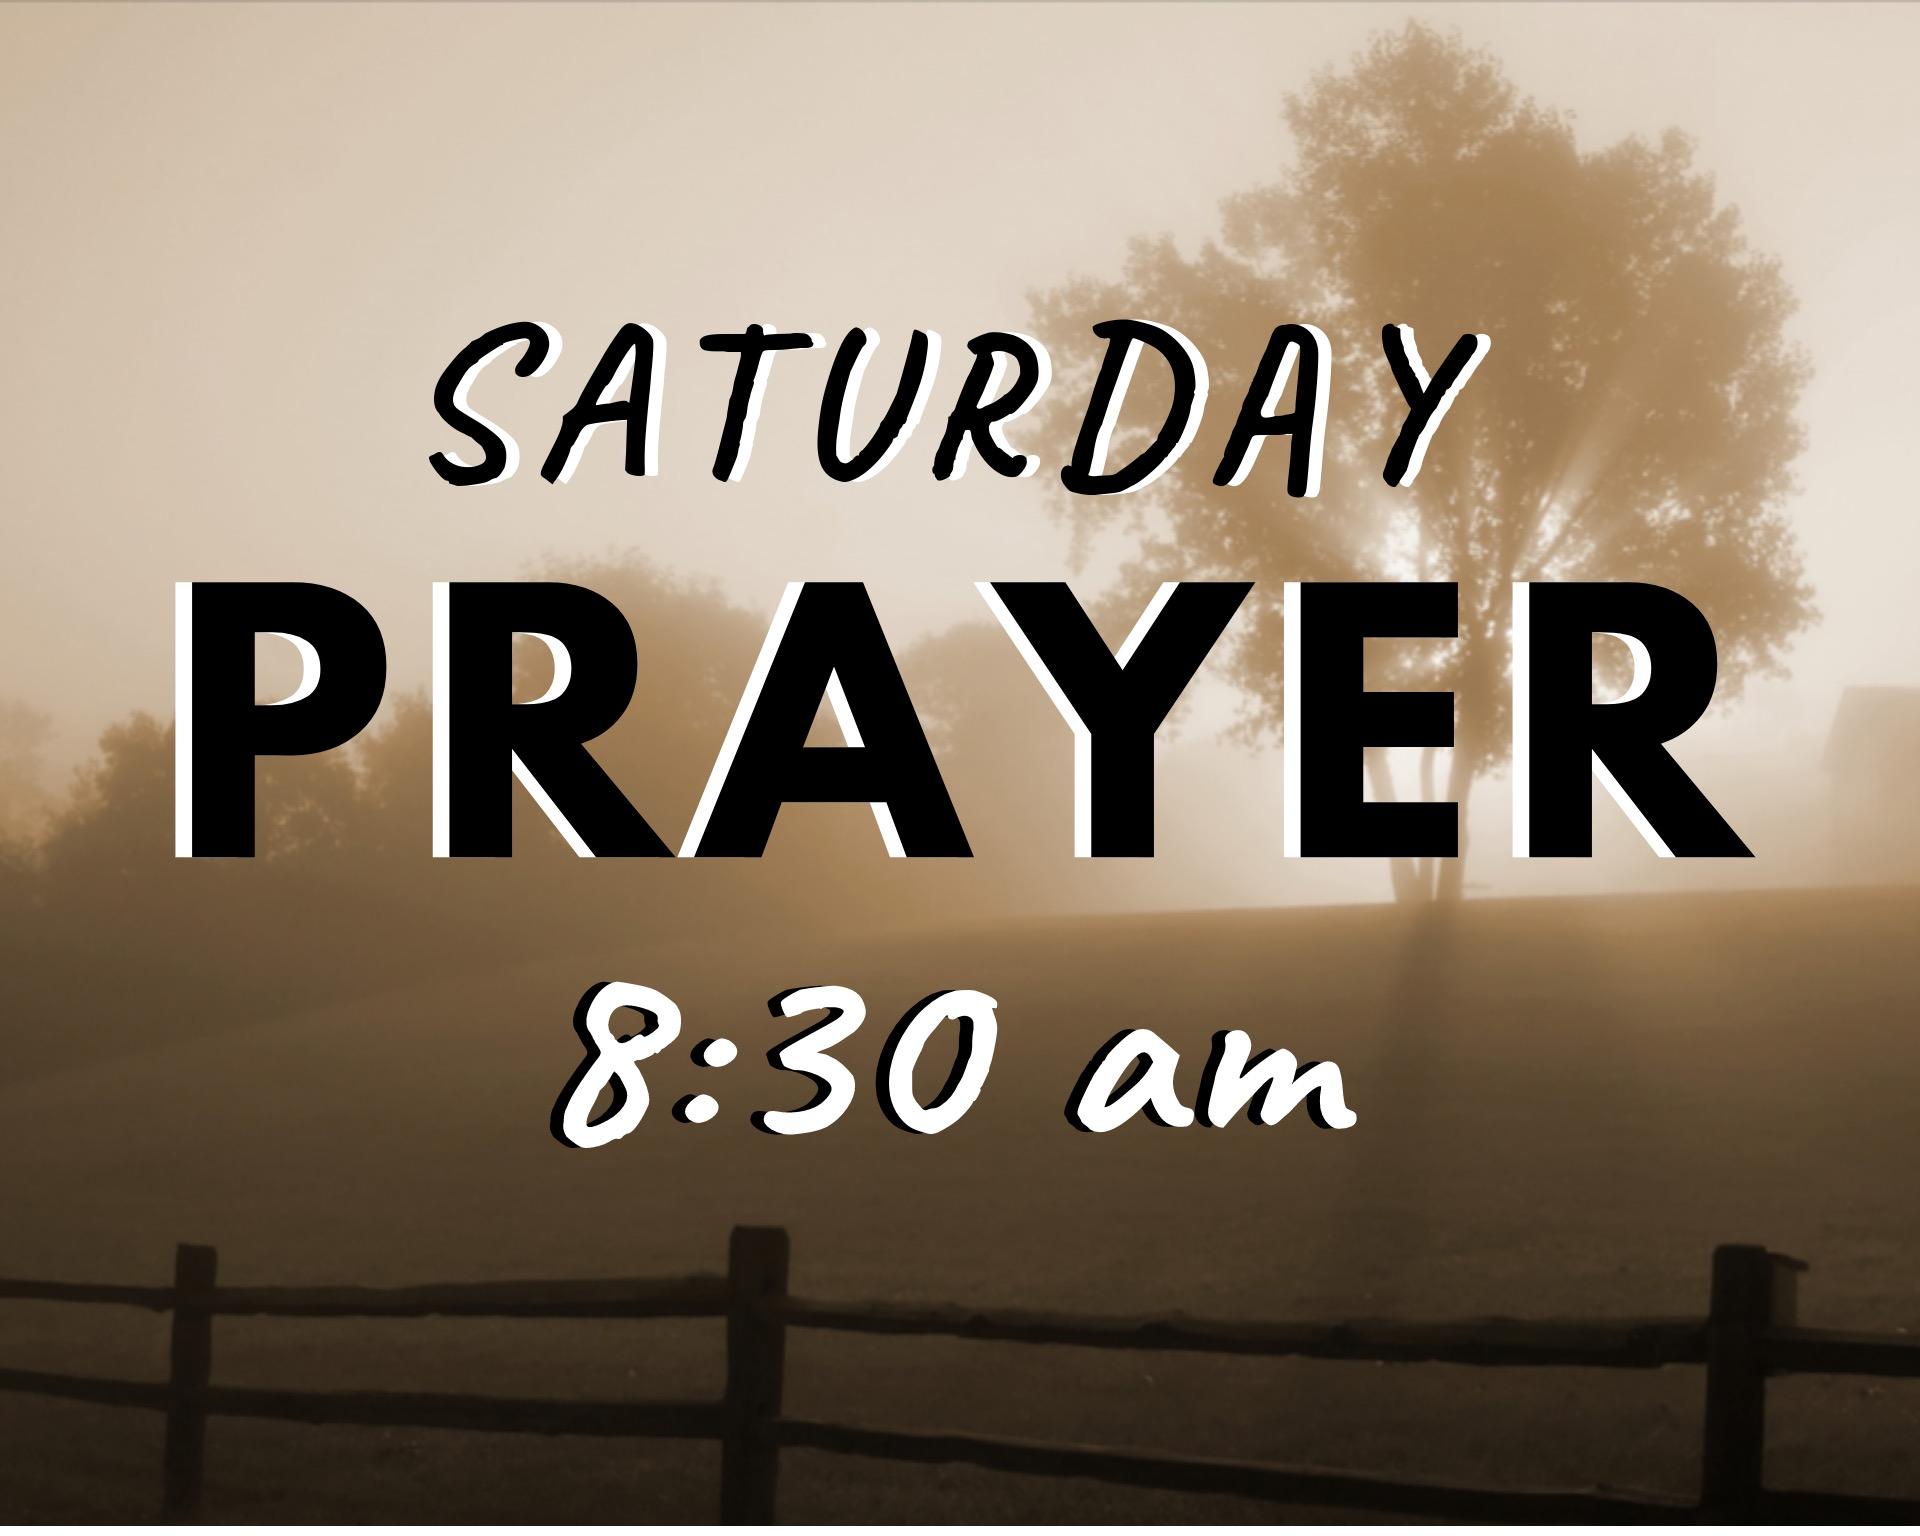 Sat. Prayer Graphic.jpeg